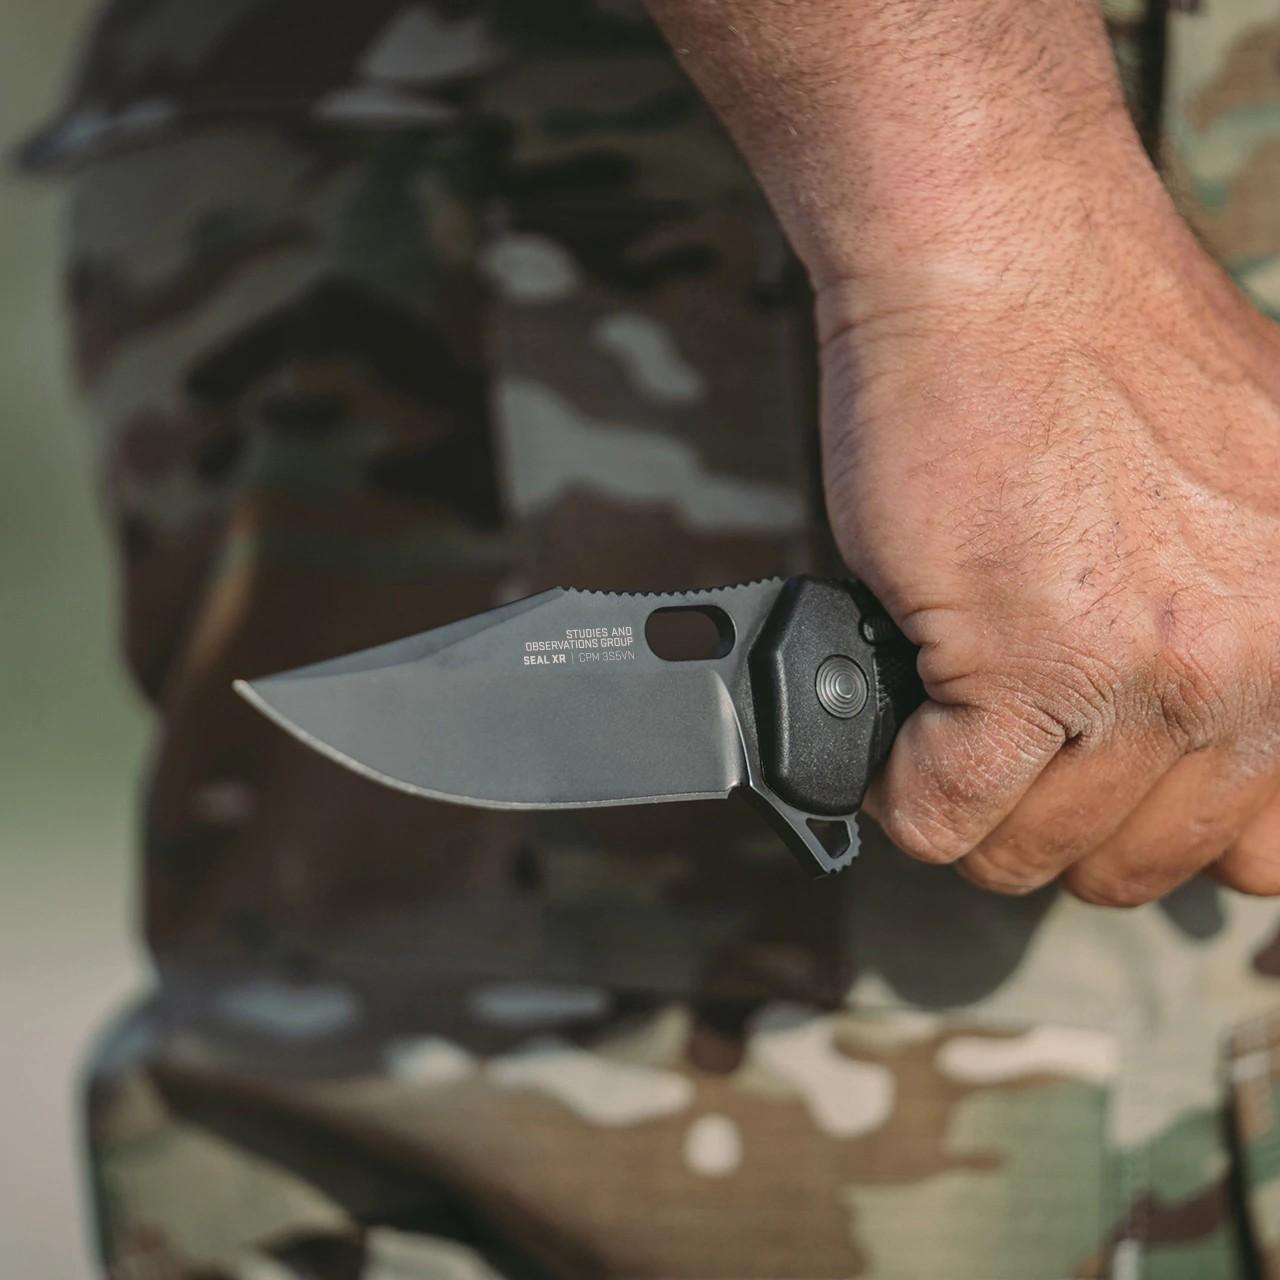 SOG KNIVES DEBUTS THE SEAL XR FOLDER KNIFE